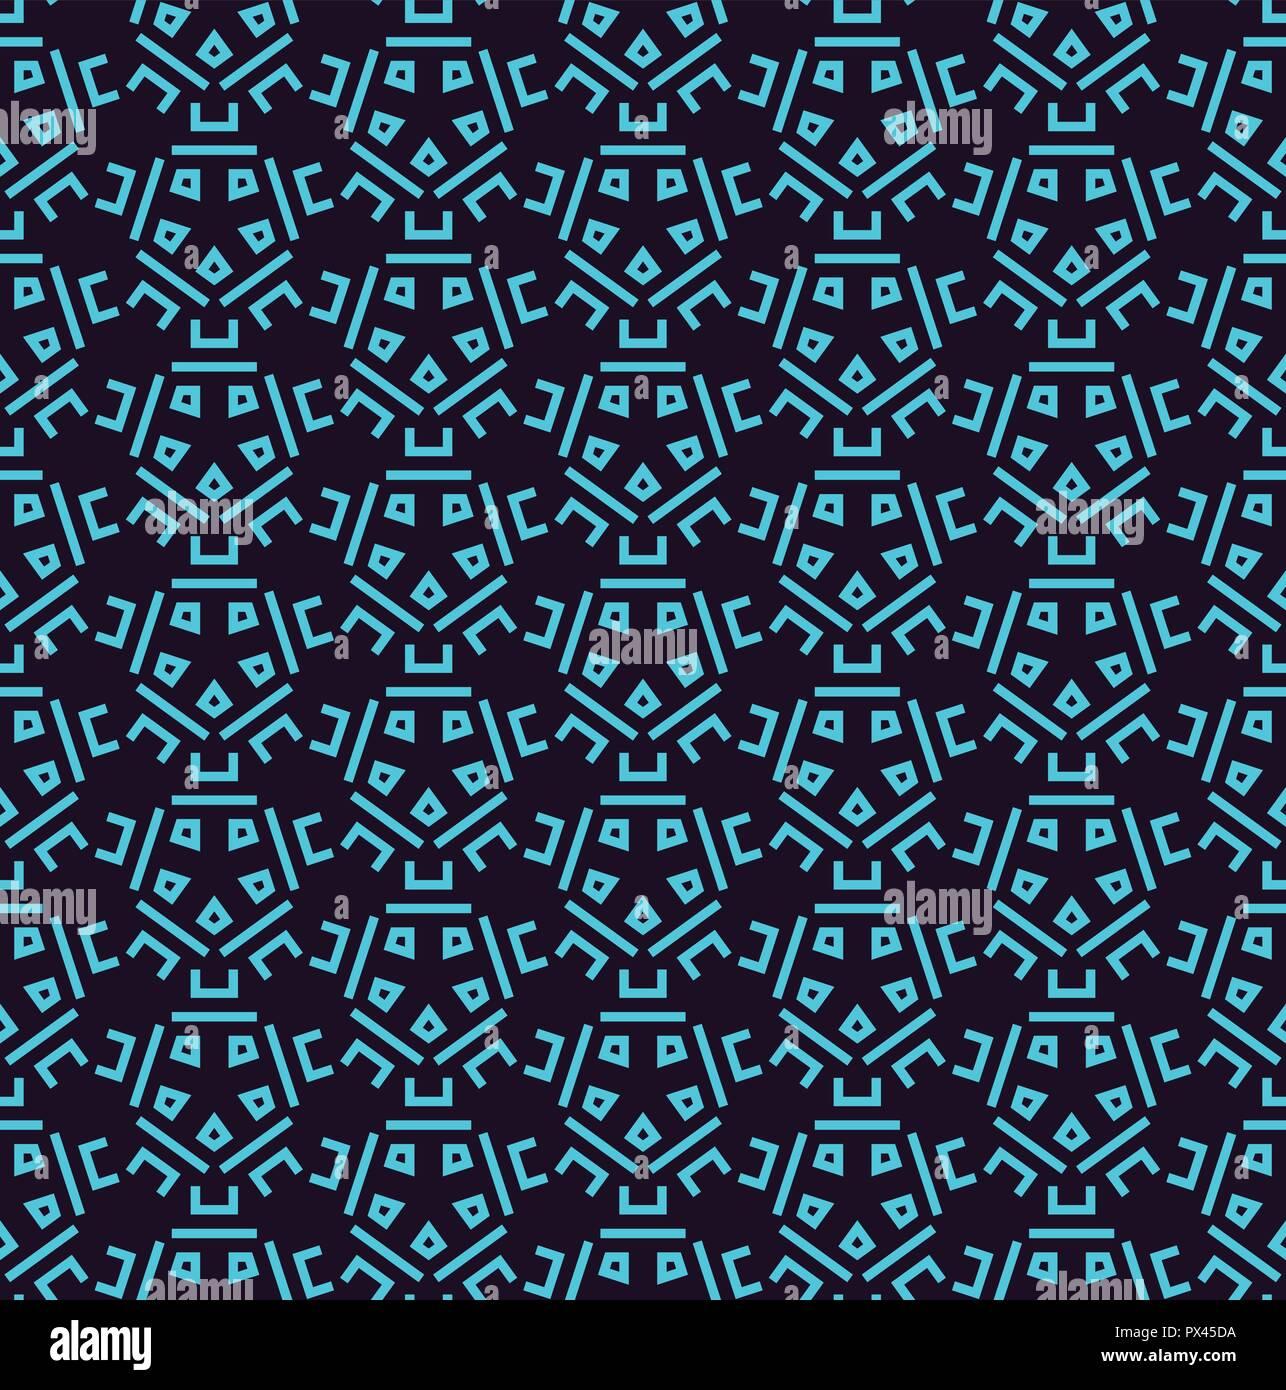 Geometrica De Lujo Sencillo Patron Minimalista Con Lineas Azules